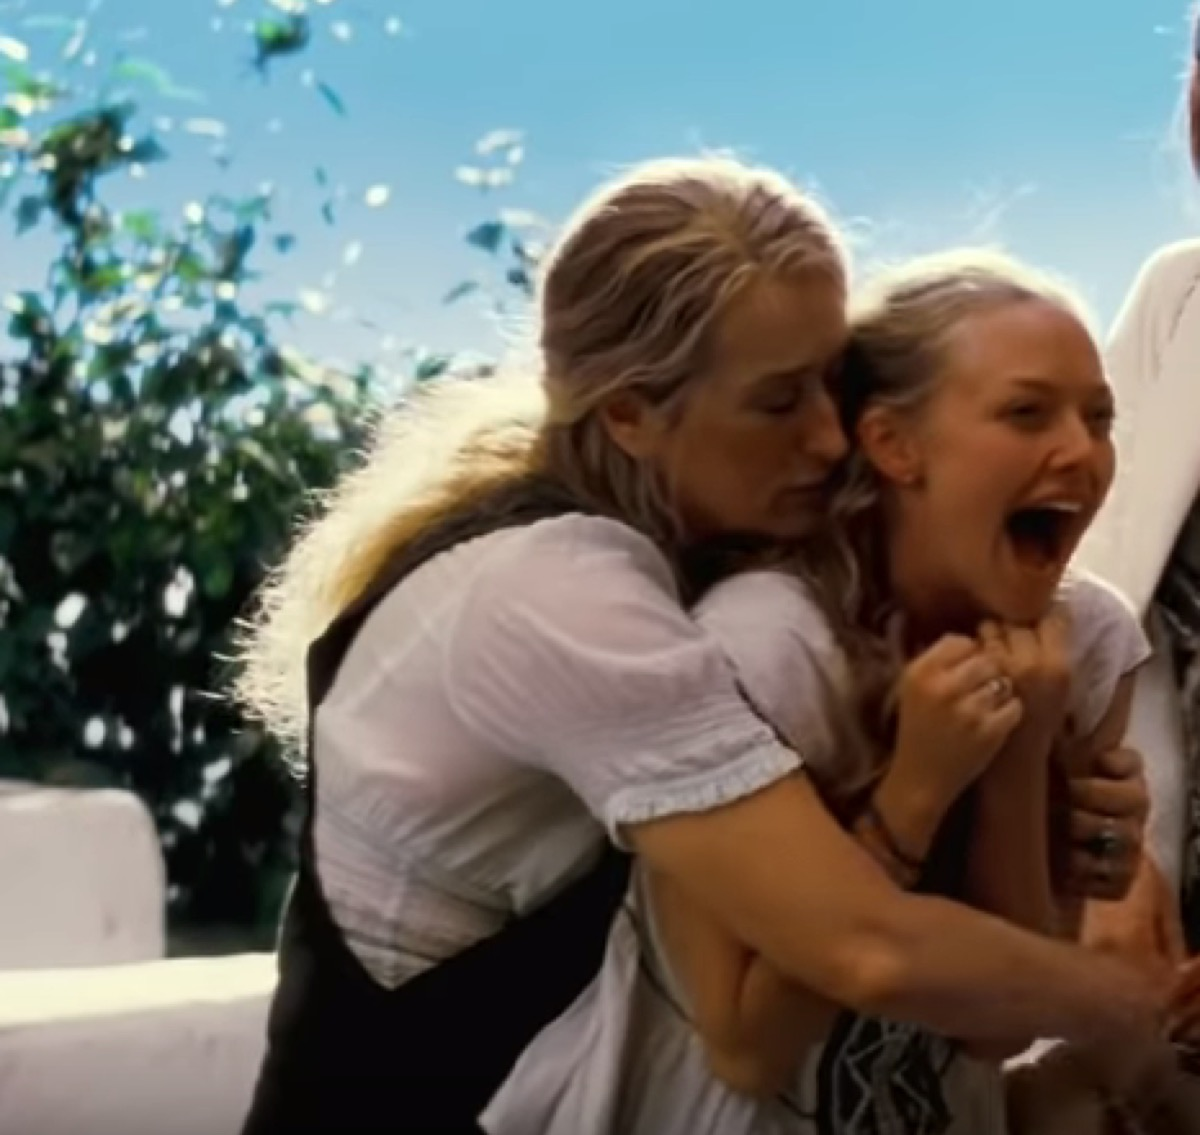 Streep and Seyfried, best romance movies on netflix